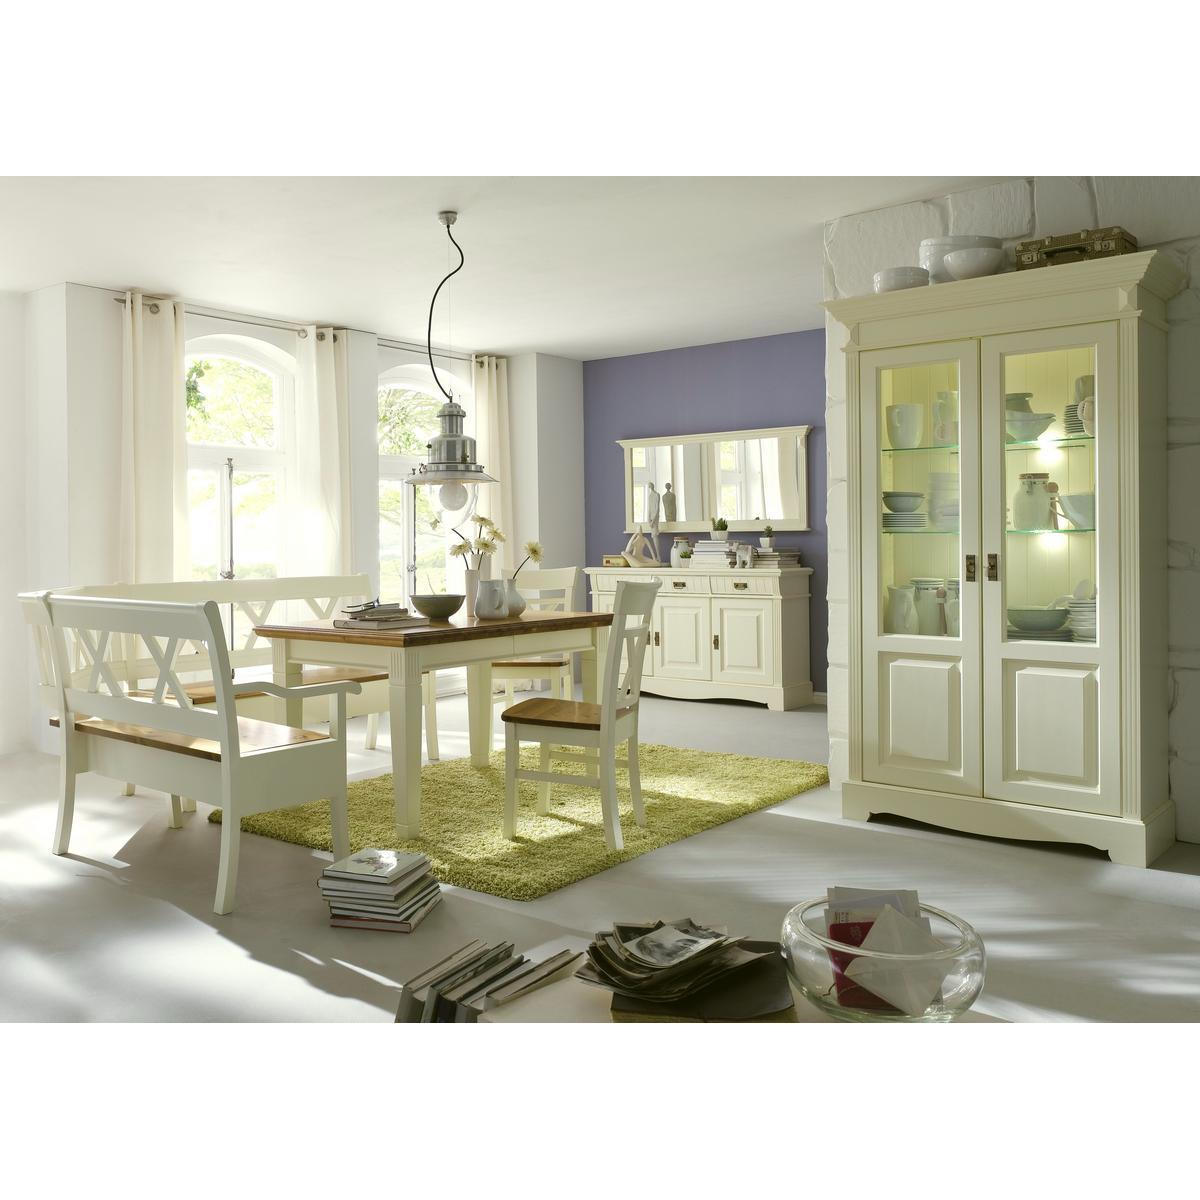 Massivholz Esszimmer Komplett Kiefer Massiv 2 Farbig Weiß Goldbraun  Landhausstil PARIS   Eckbank, Vintage